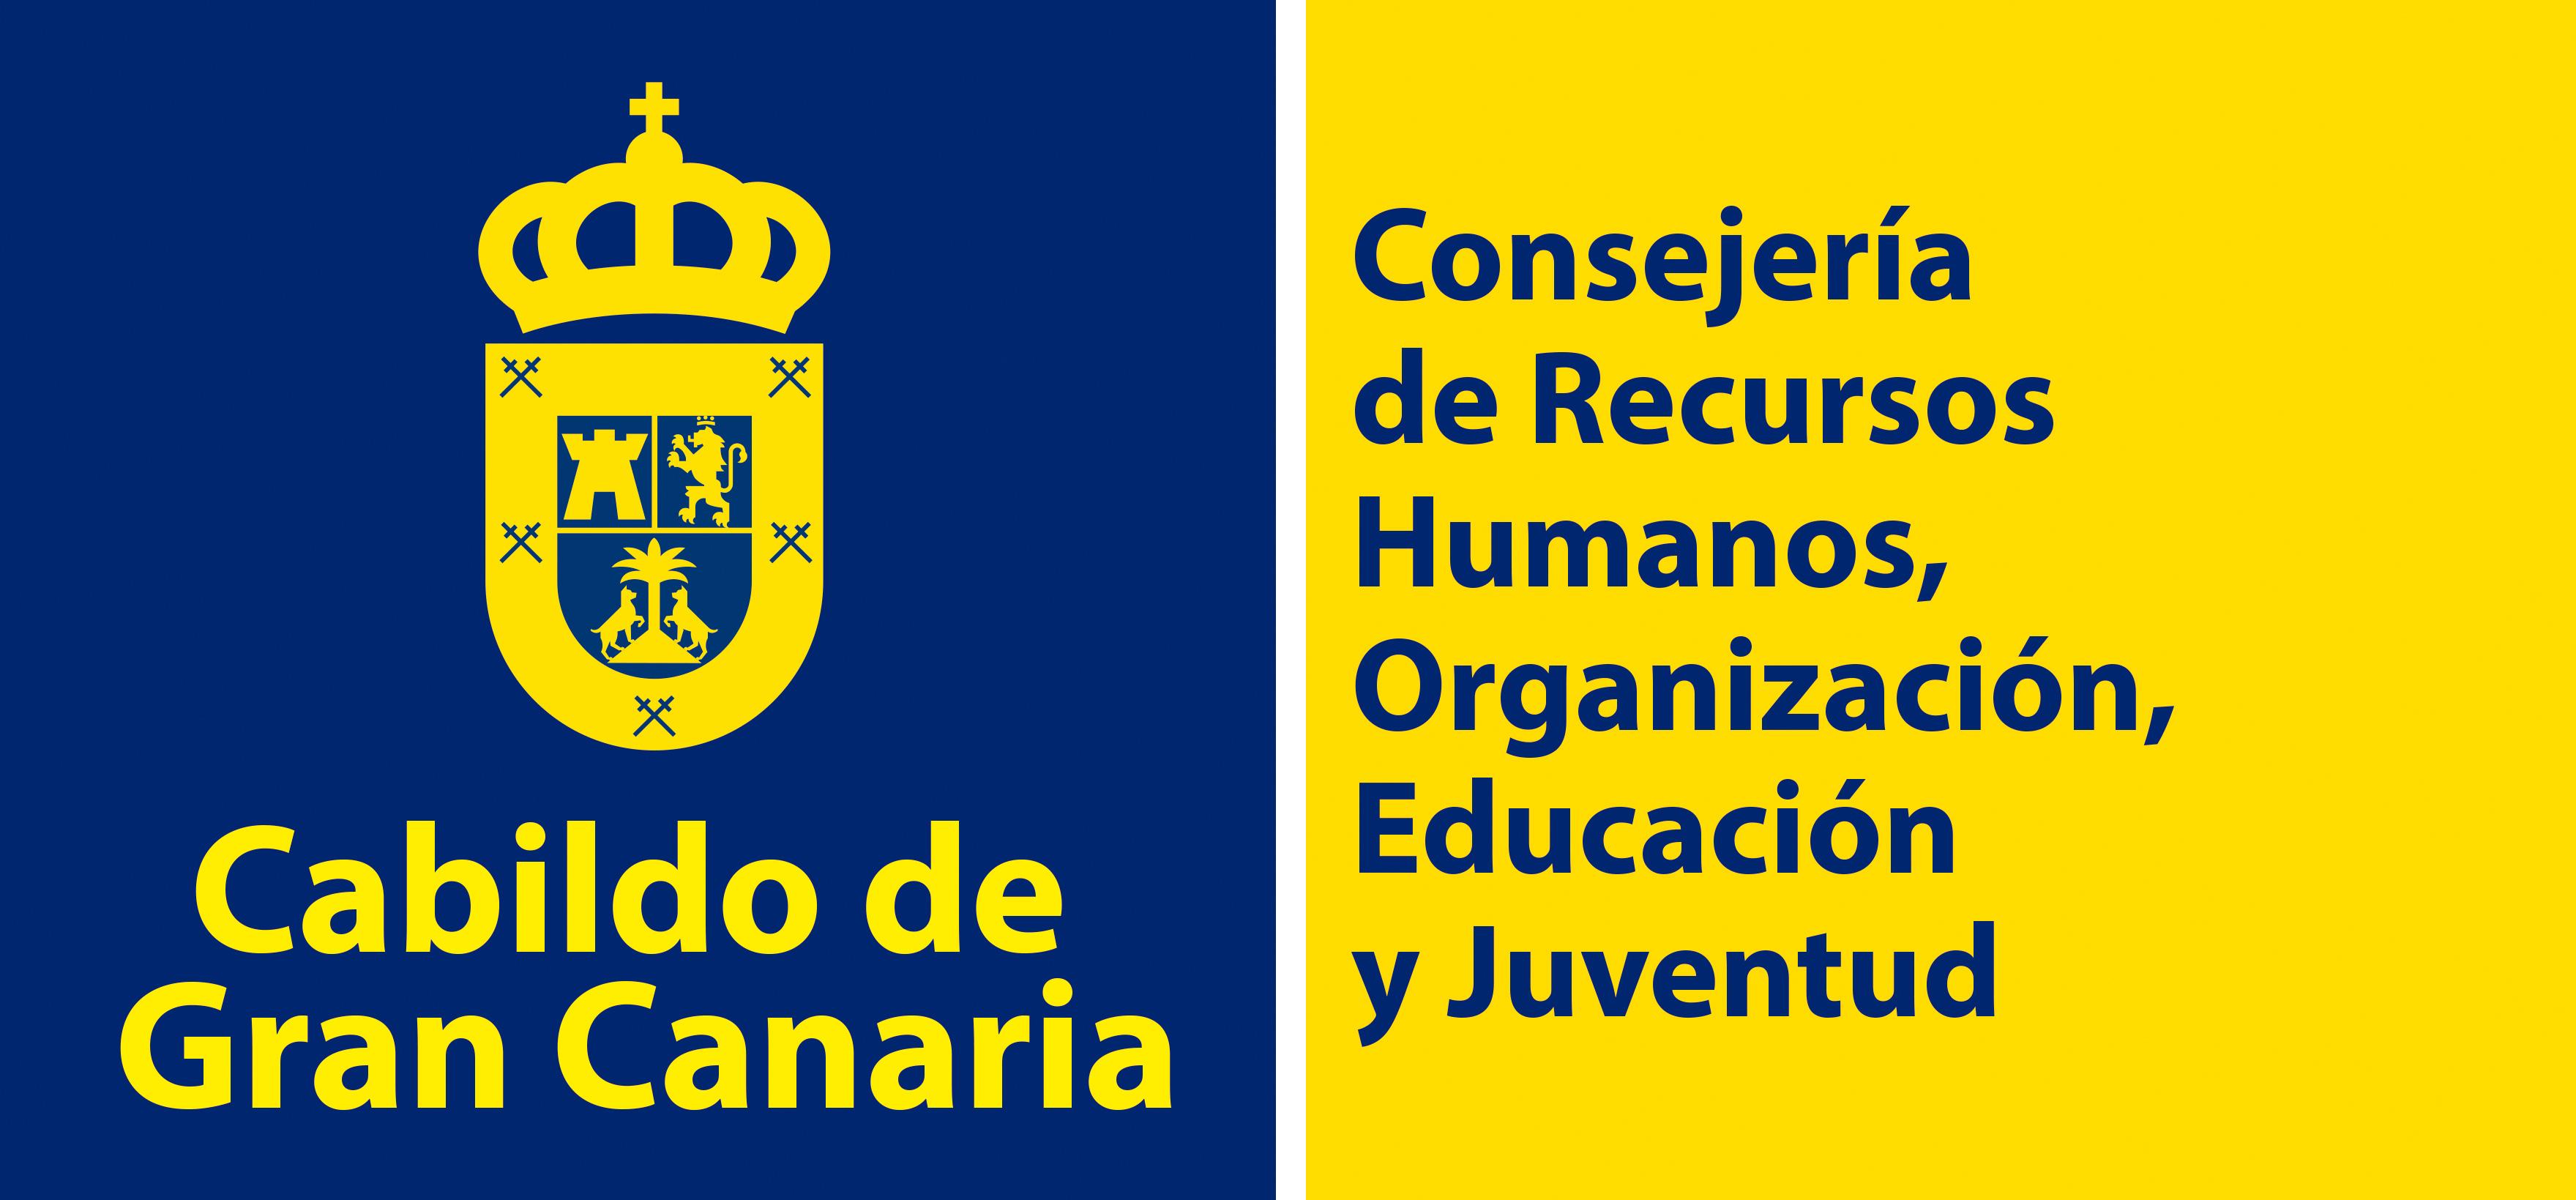 Cabildo de Gran Canaria (CGC)